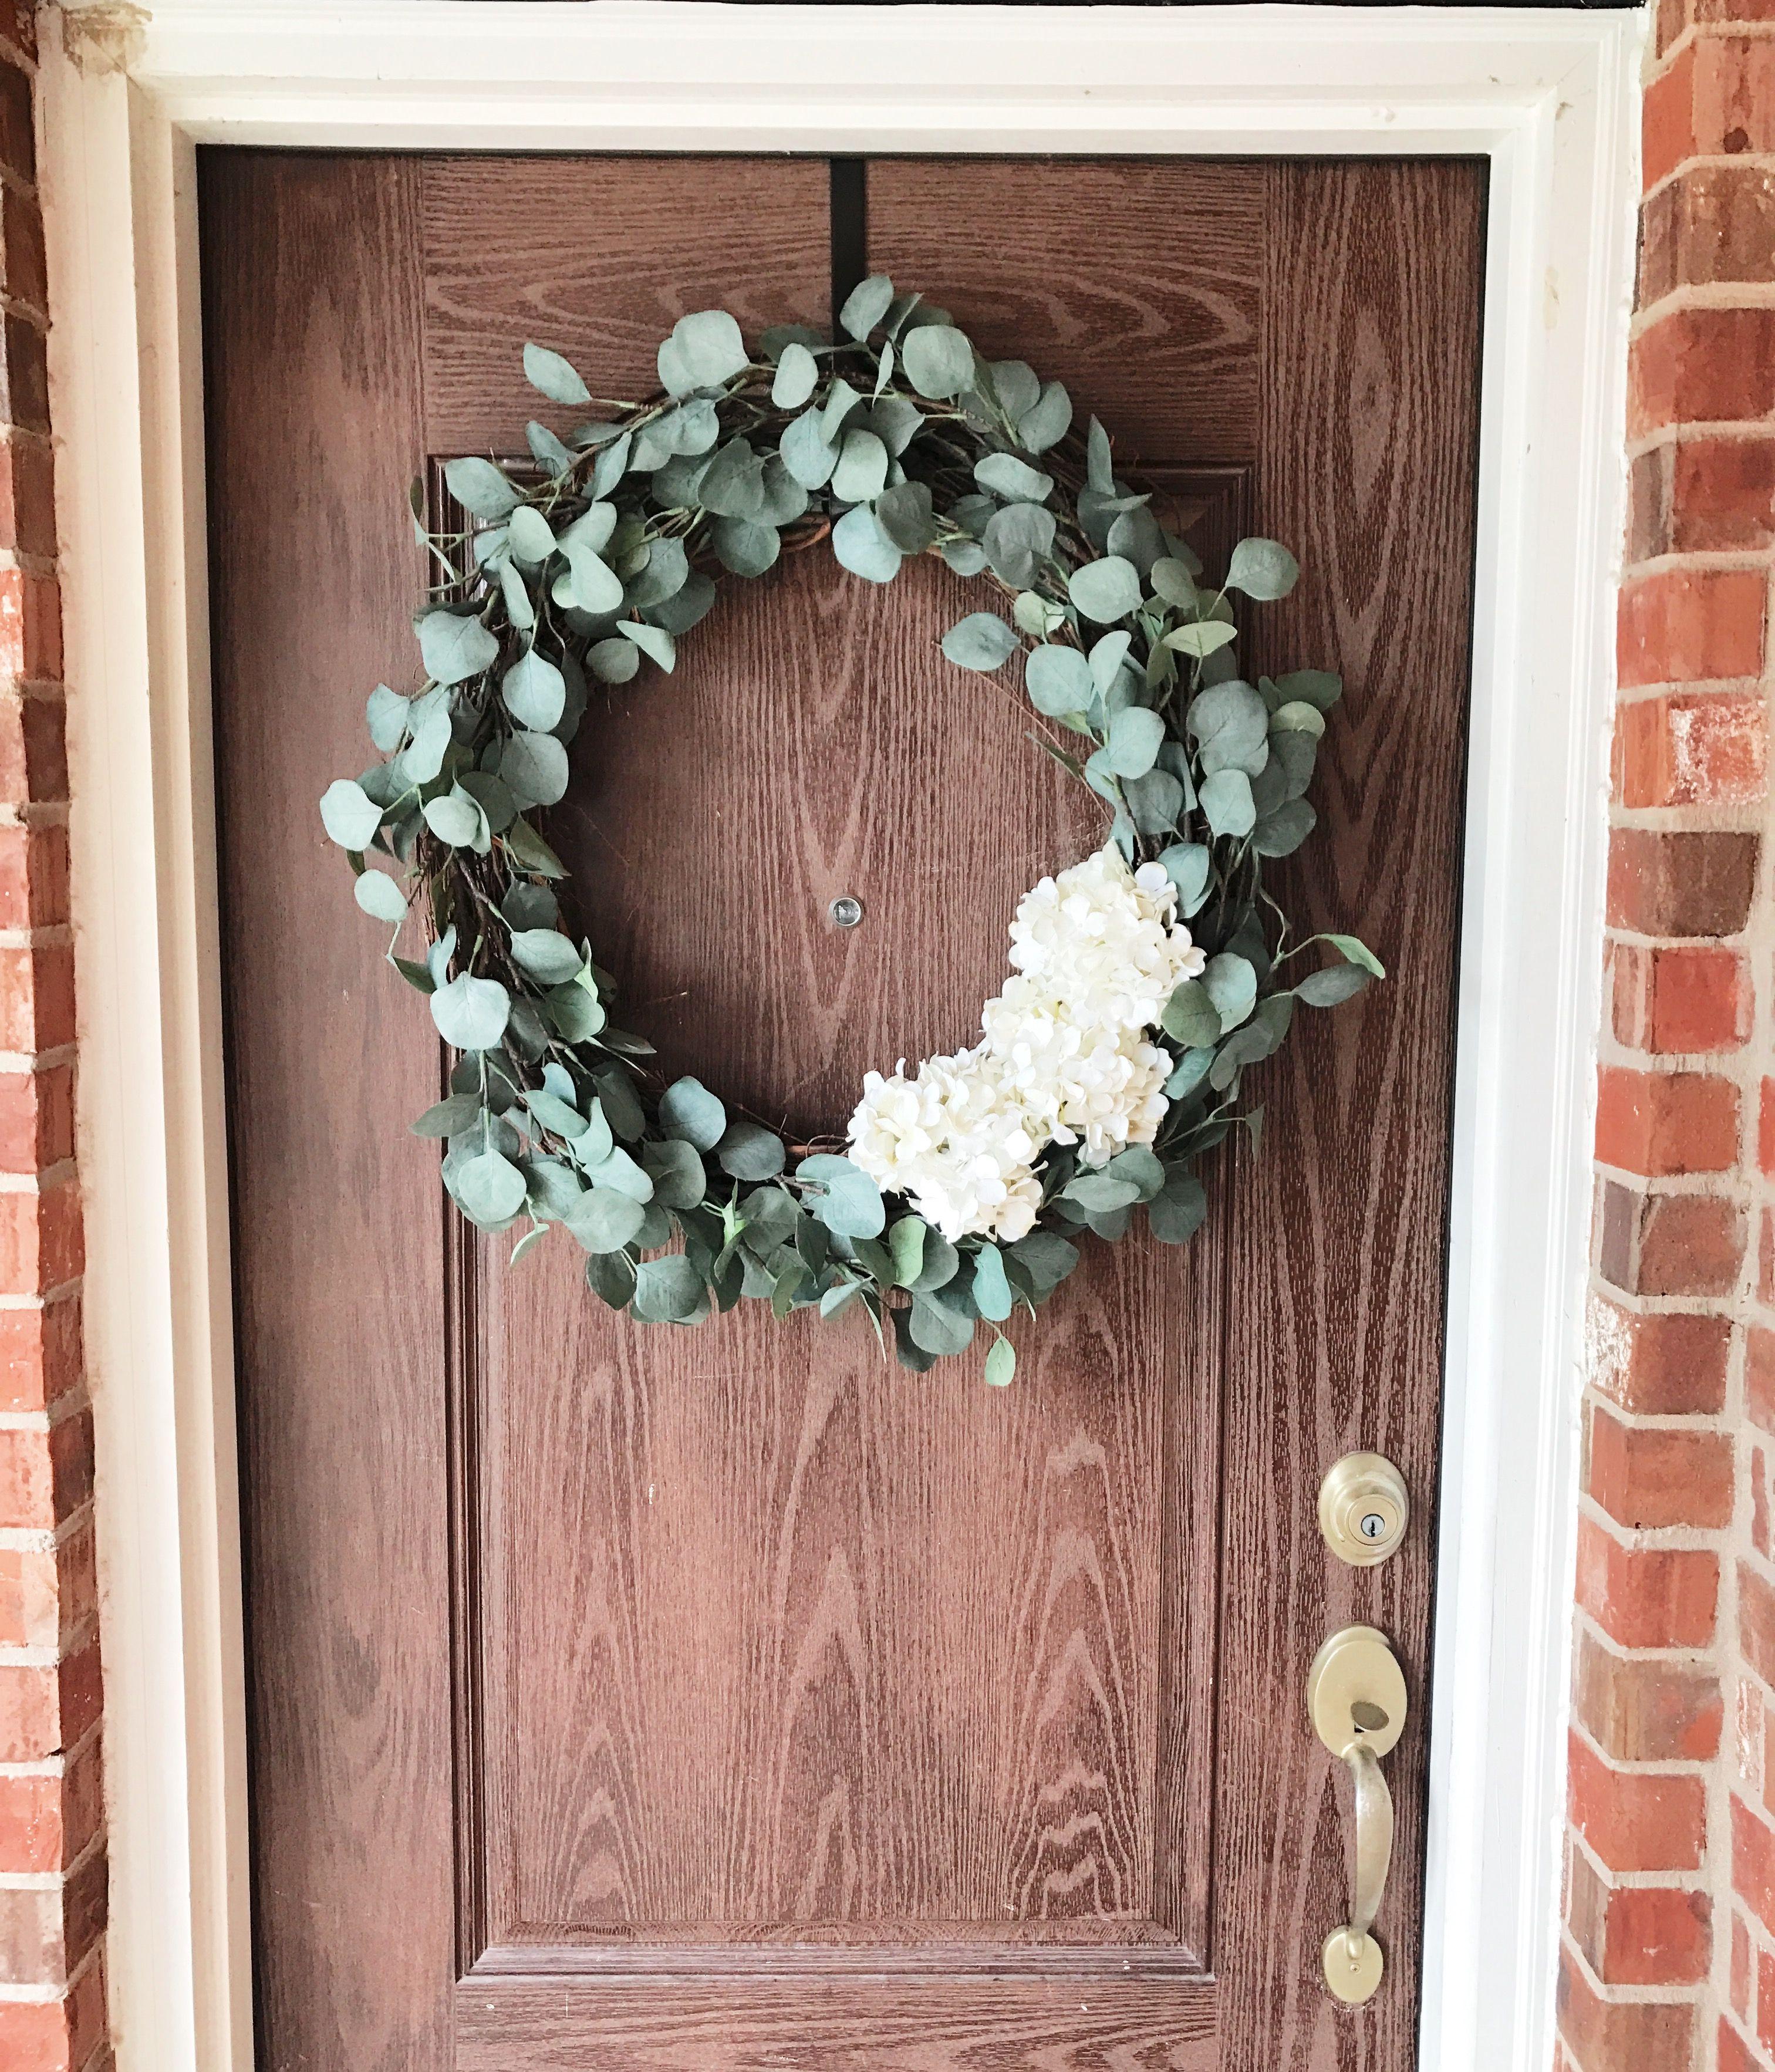 Diy Eucalyptus Wreath 24 Wreath And 3 White Hydrangeas